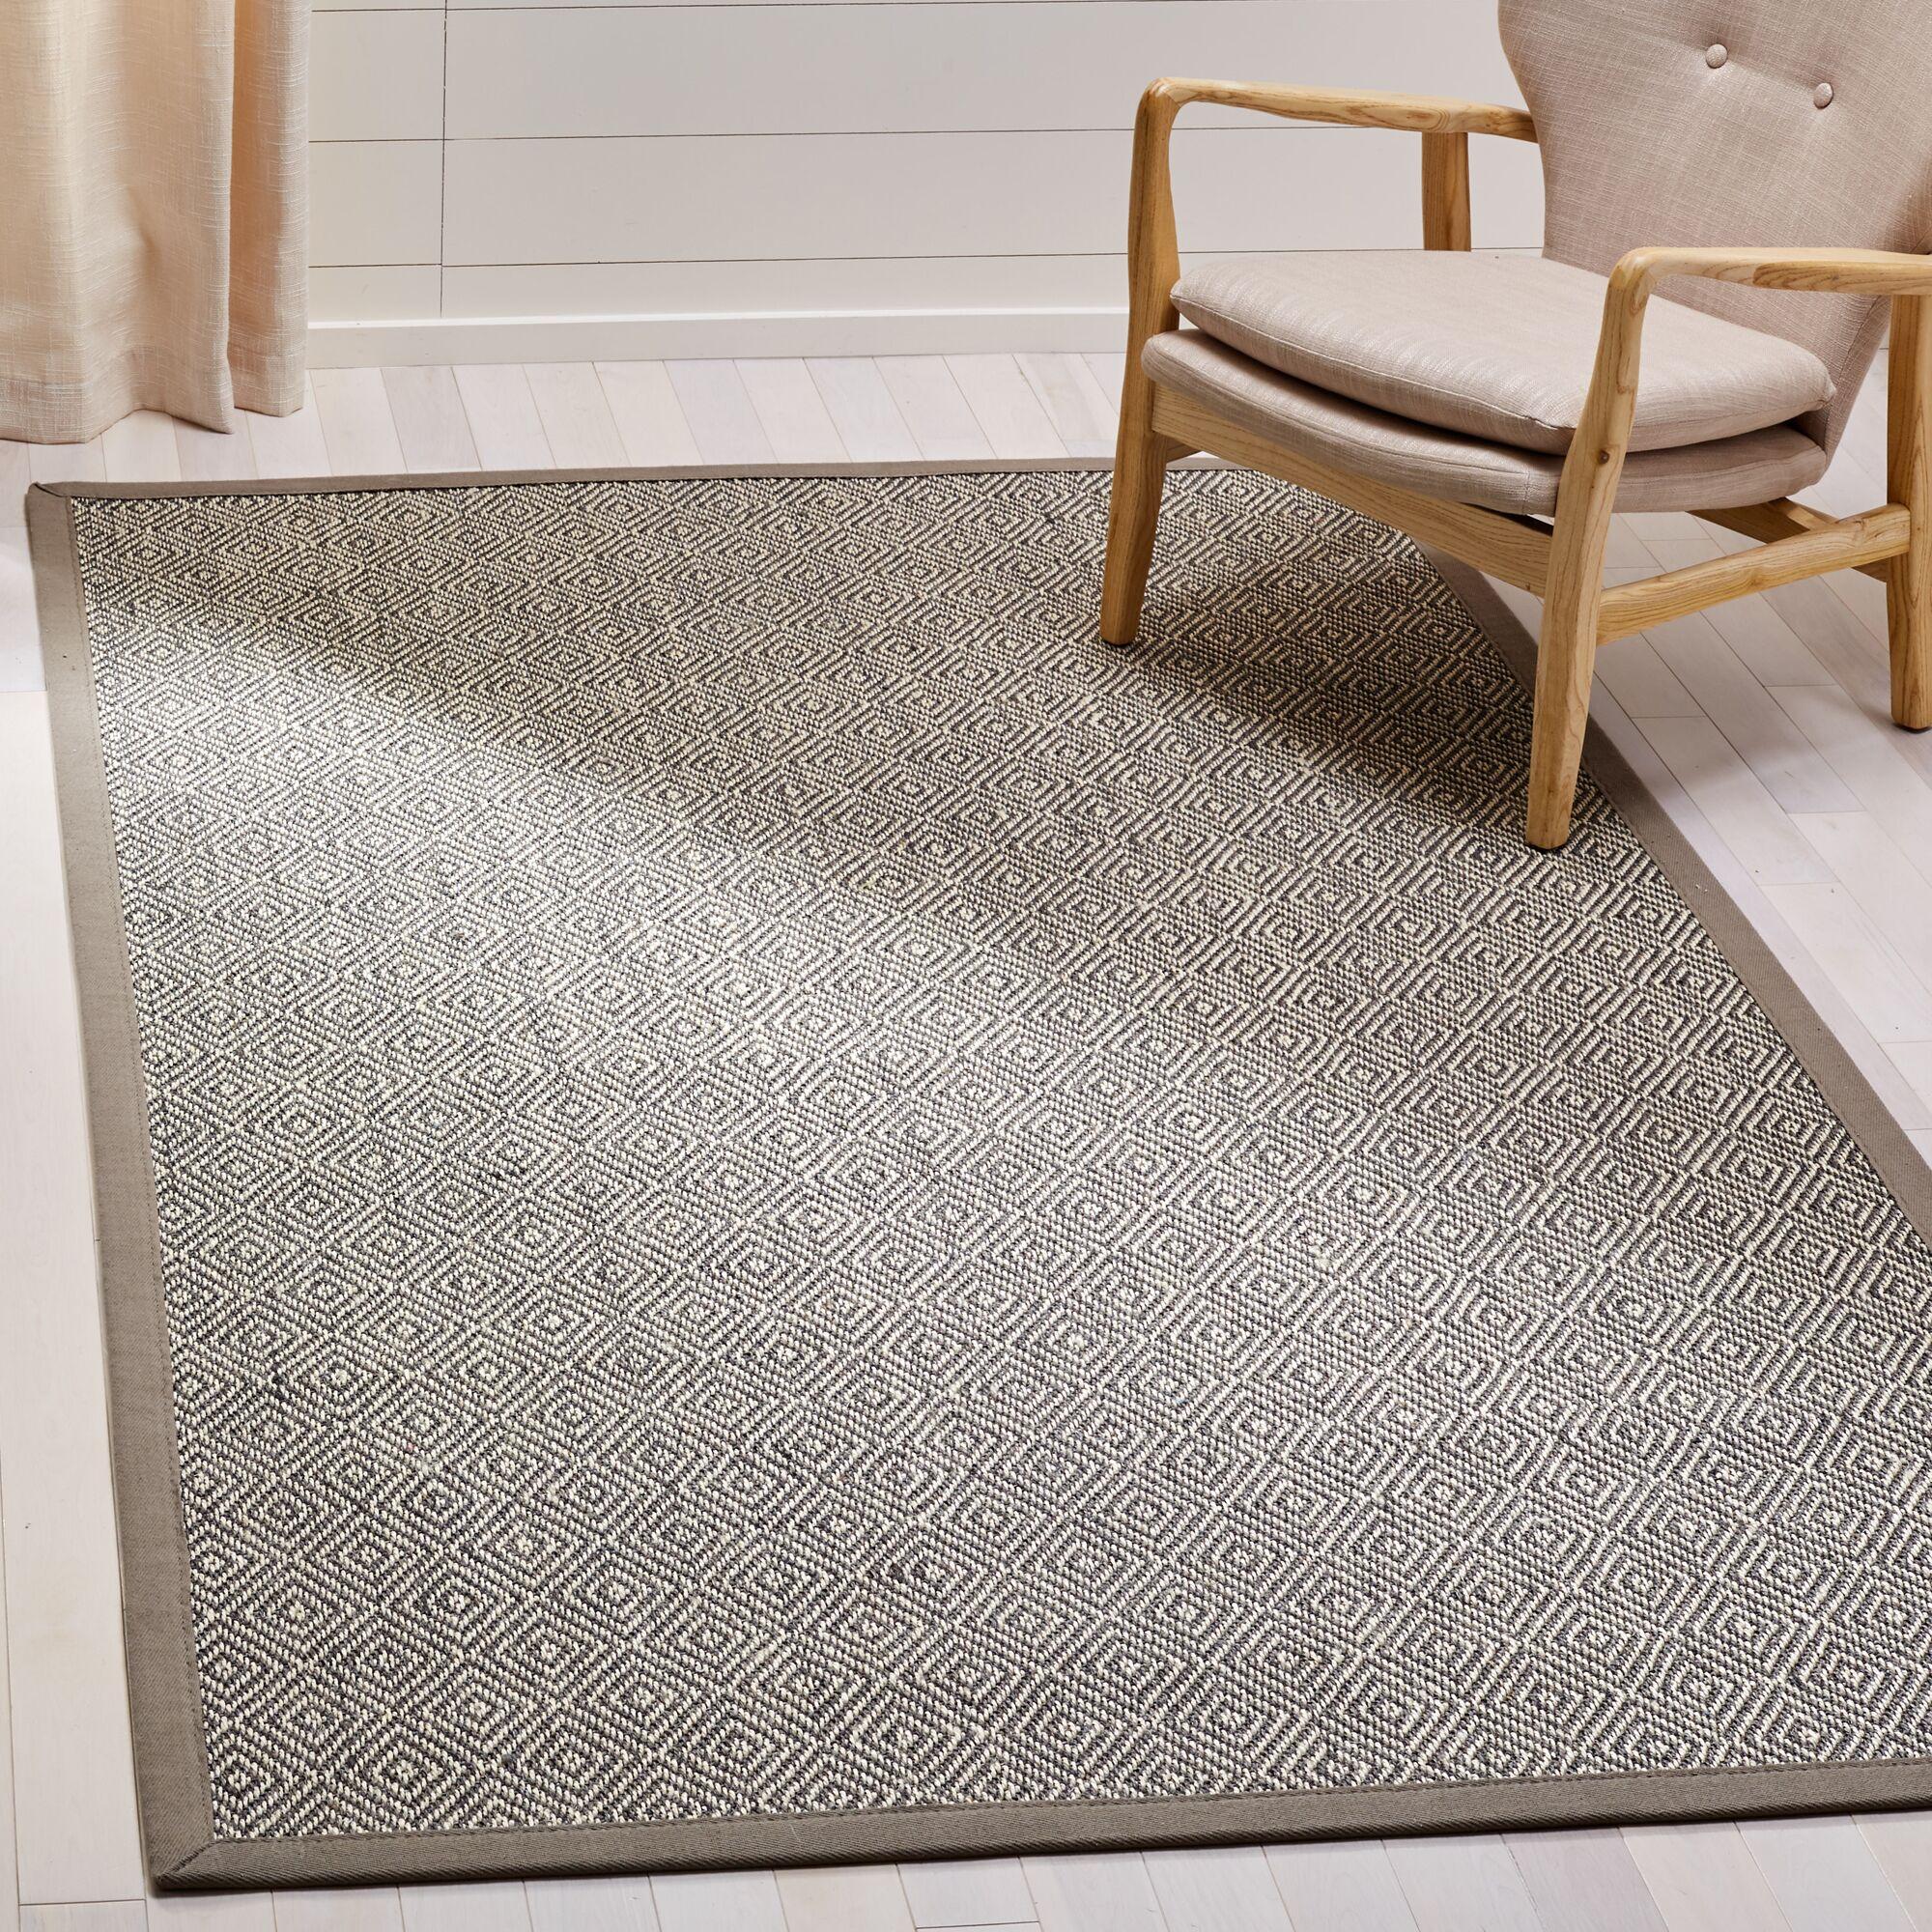 Chairez Beige Area Rug Rug Size: Rectangle 5' x 8'